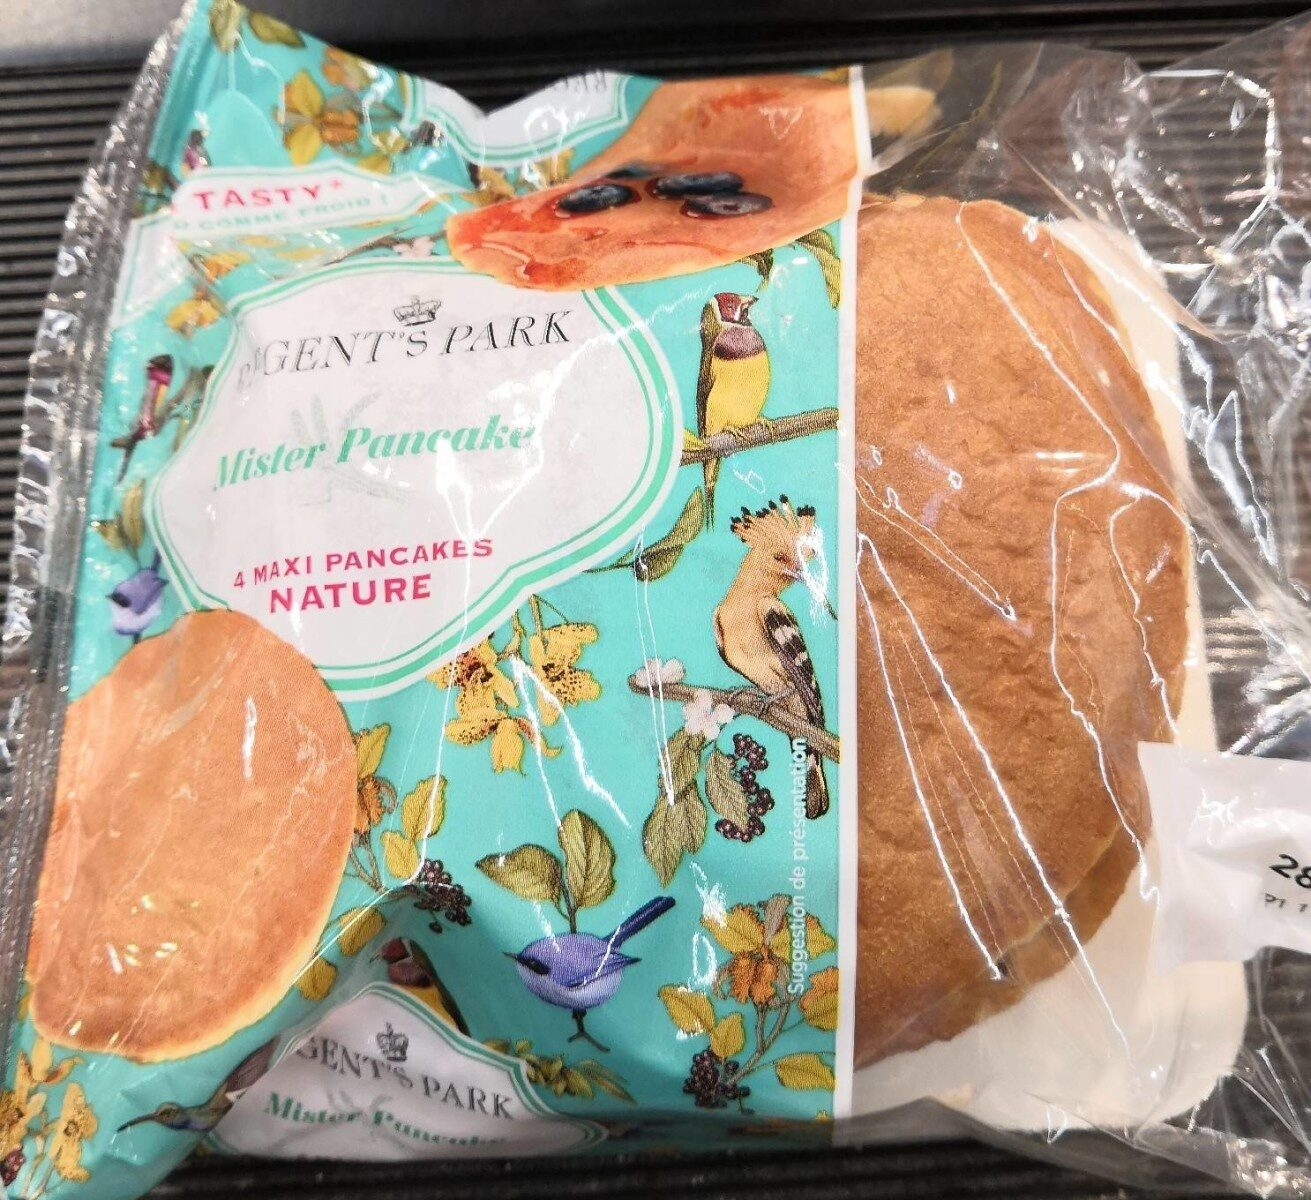 Mister Pancake - 4 Maxi Pancakes Nature - Product